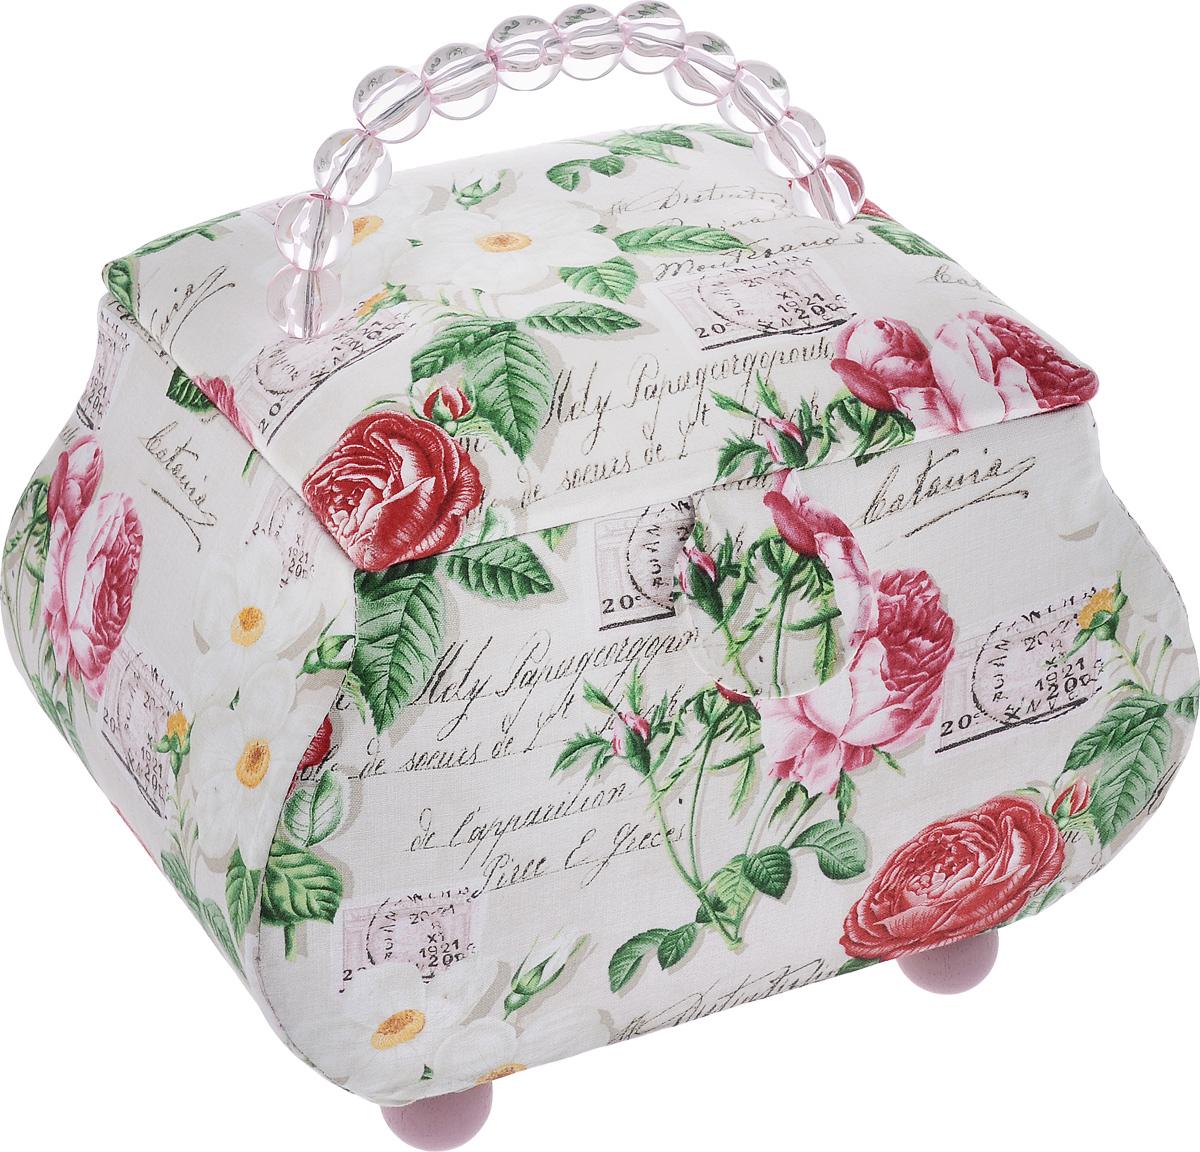 Шкатулка для рукоделия RTO Посылка, 26,5 х 20 х 21 см шкатулка для рукоделия rto цветочки с вкладышем 23 х 23 х 14 5 см